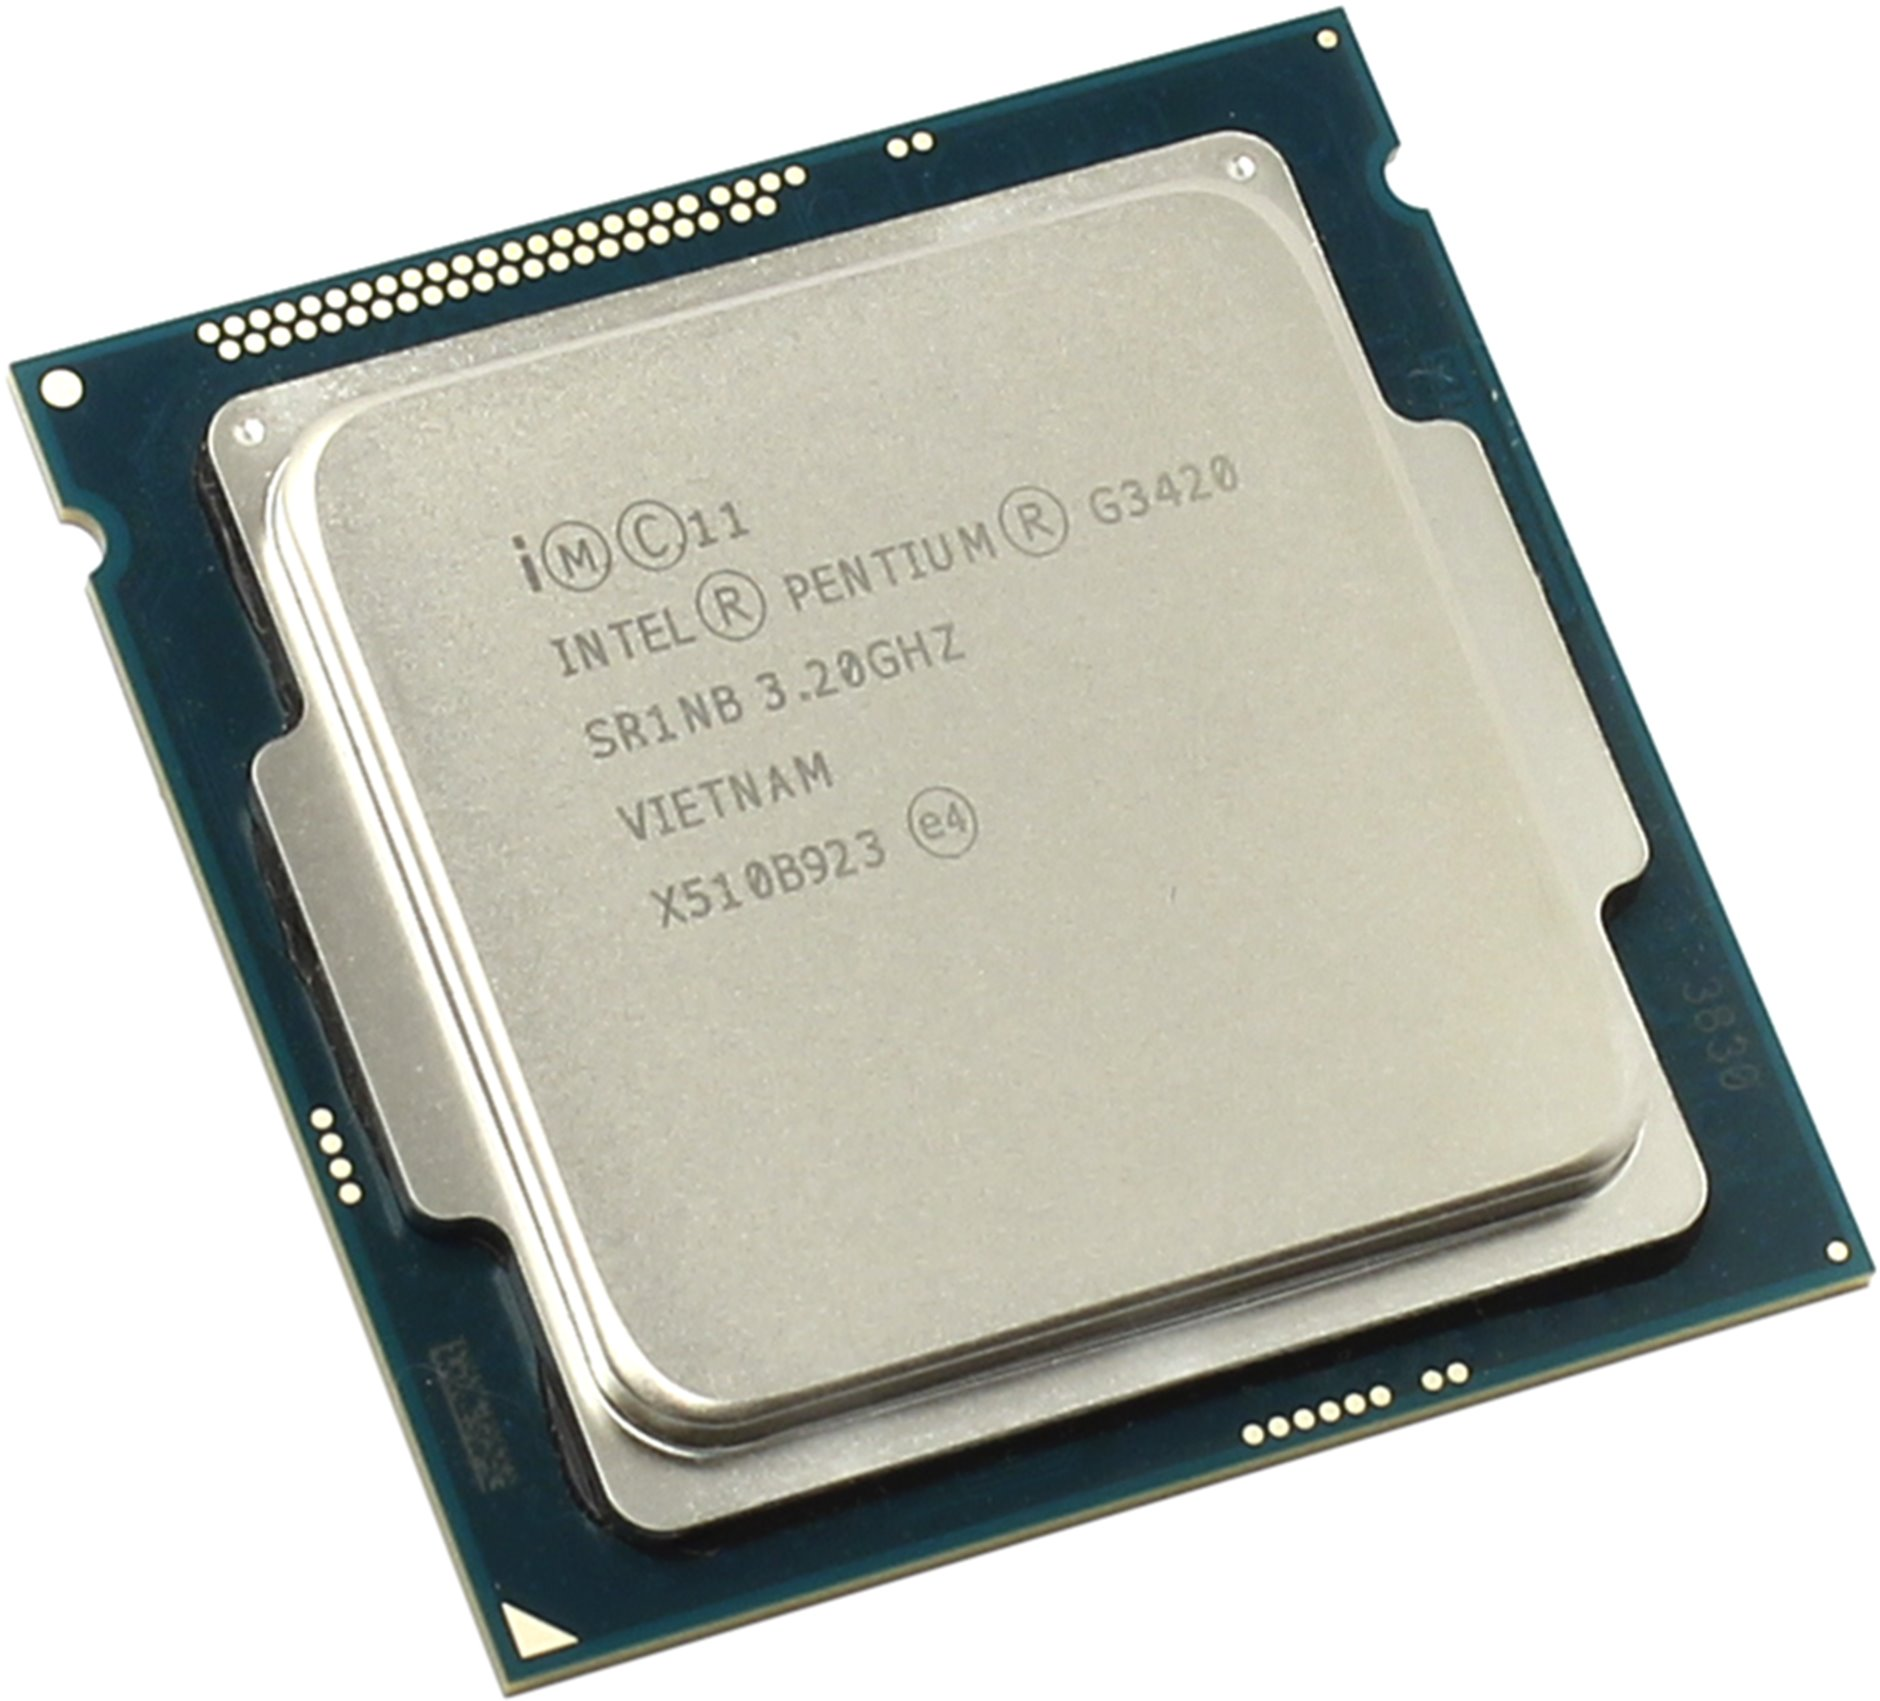 Intel Pentium G3420 (3.20GHz/ 3MB Cache/ SK 1150)